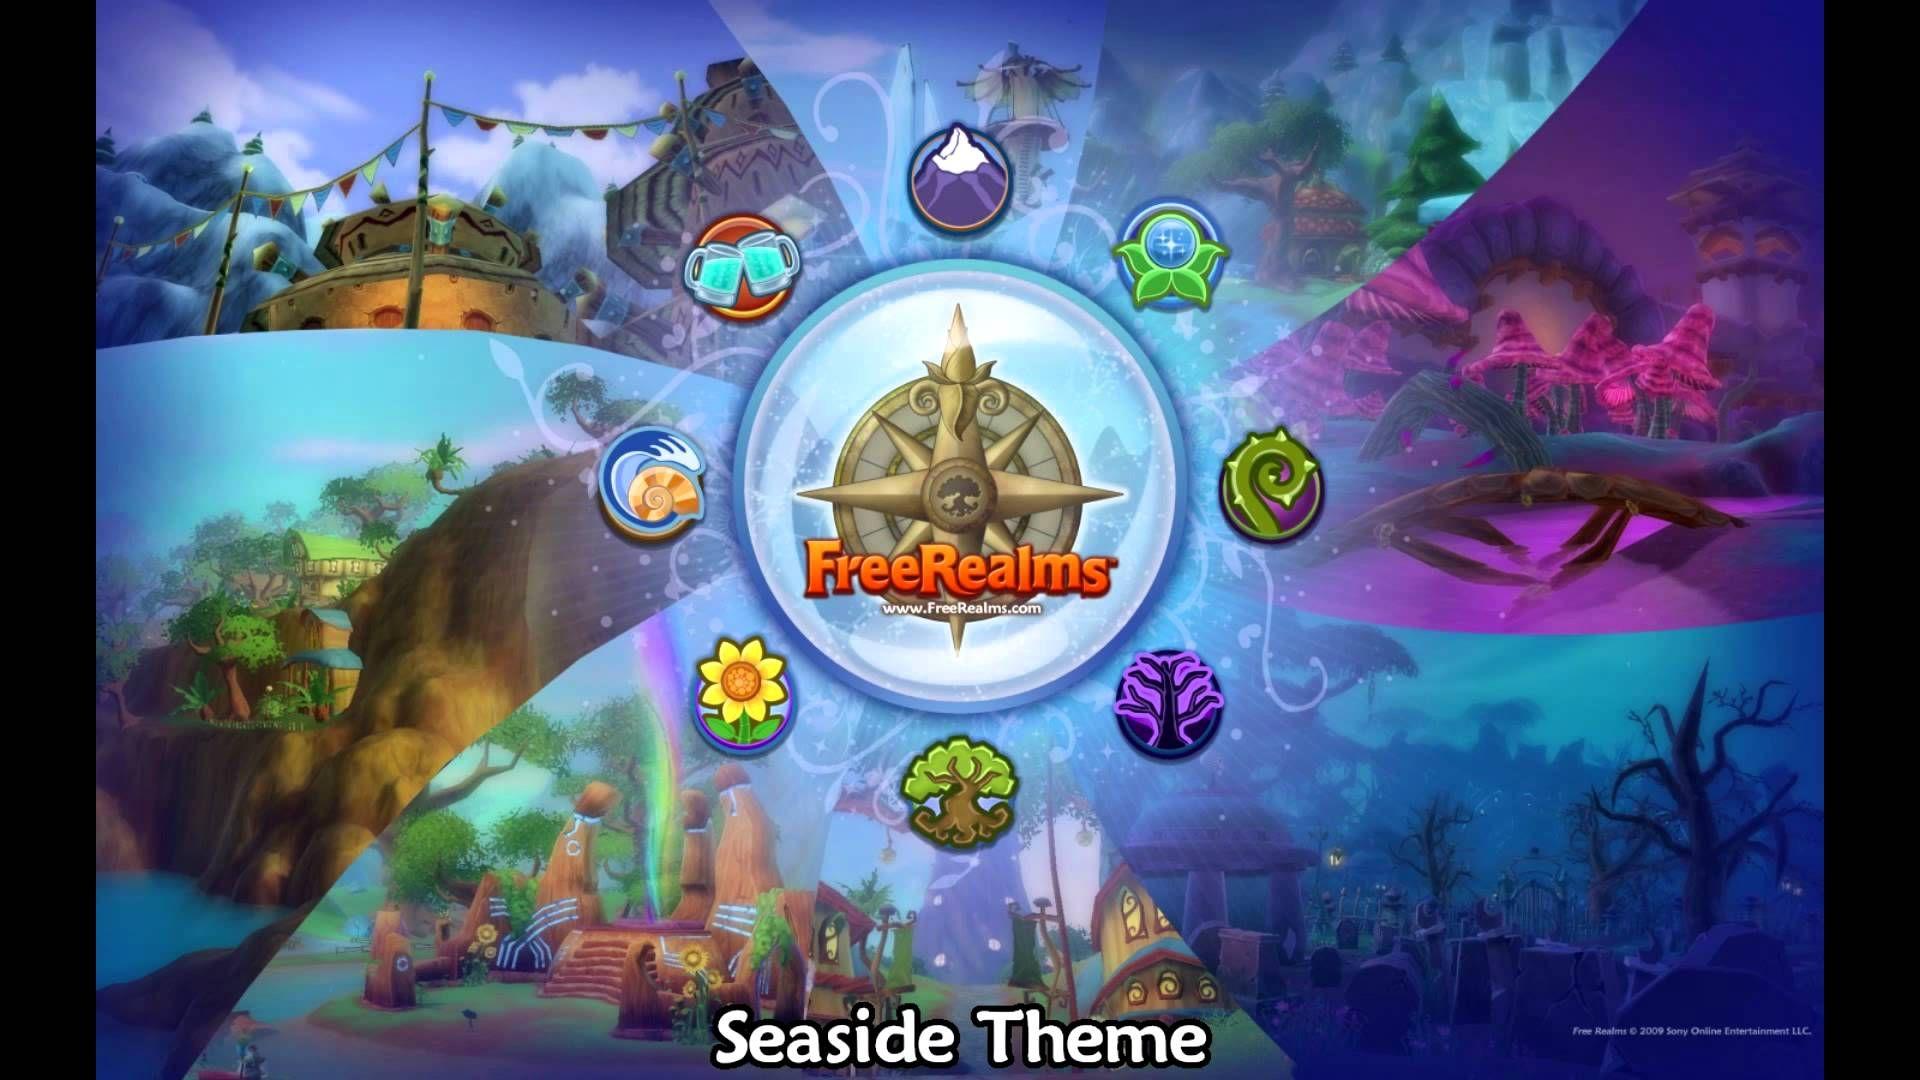 Free Realms OST - Seaside